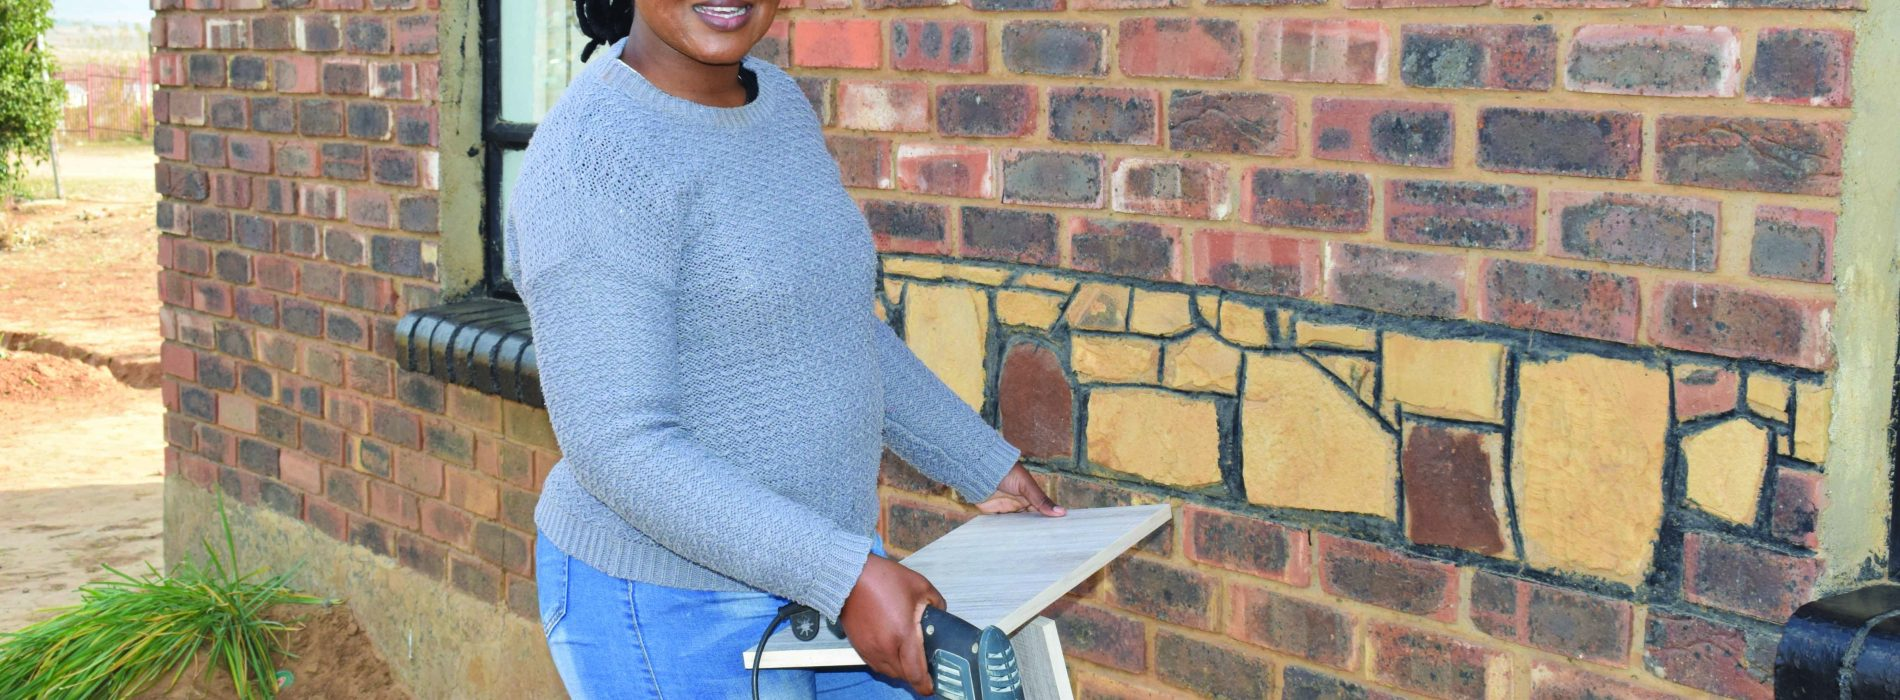 Woman  carpenter drills her way through